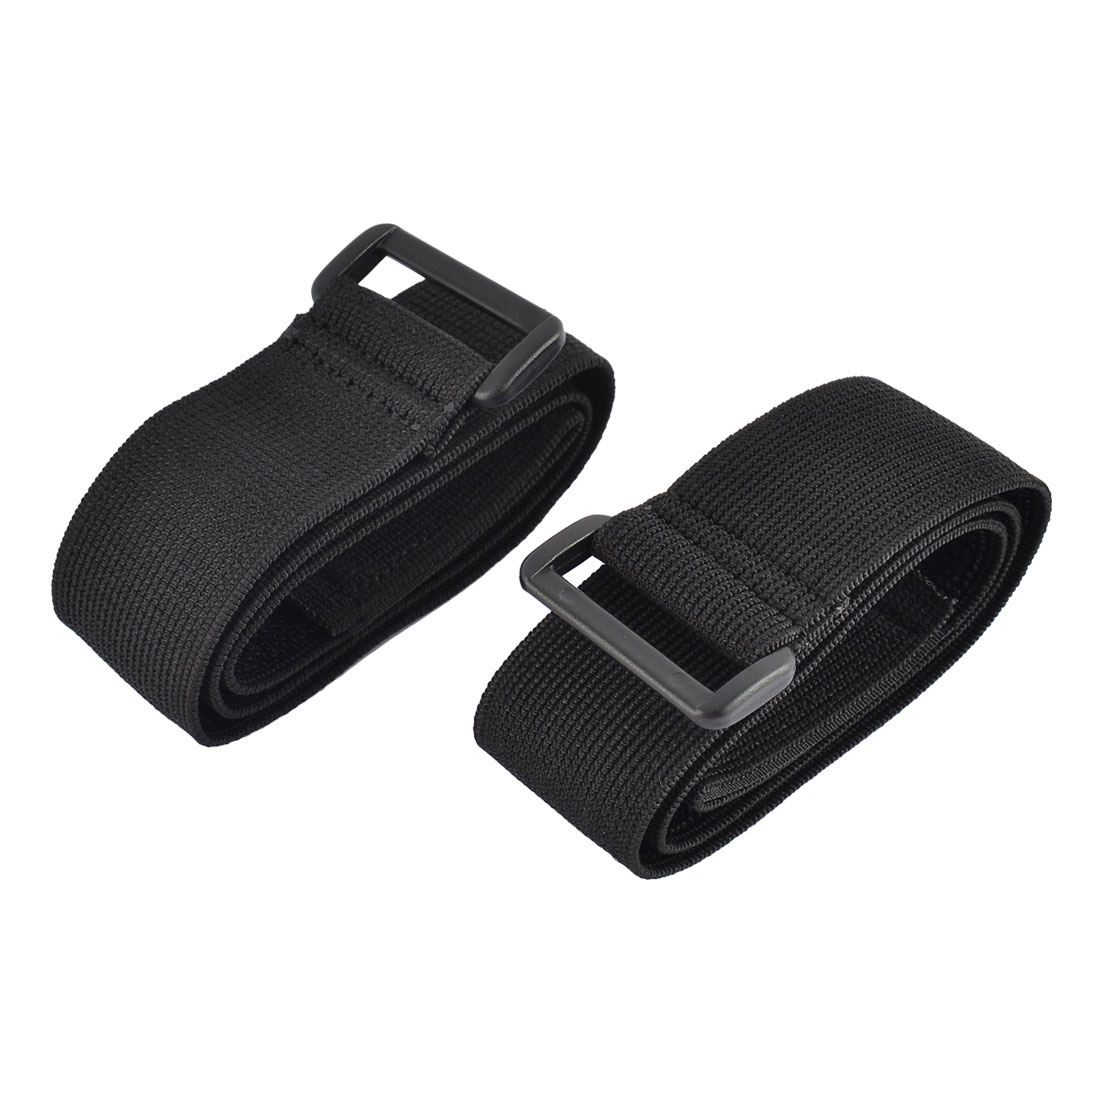 Luggage Nylon Elastic Cable Organizer Hook Loop Tie Strap Black 3.8 x 70cm 2pcs